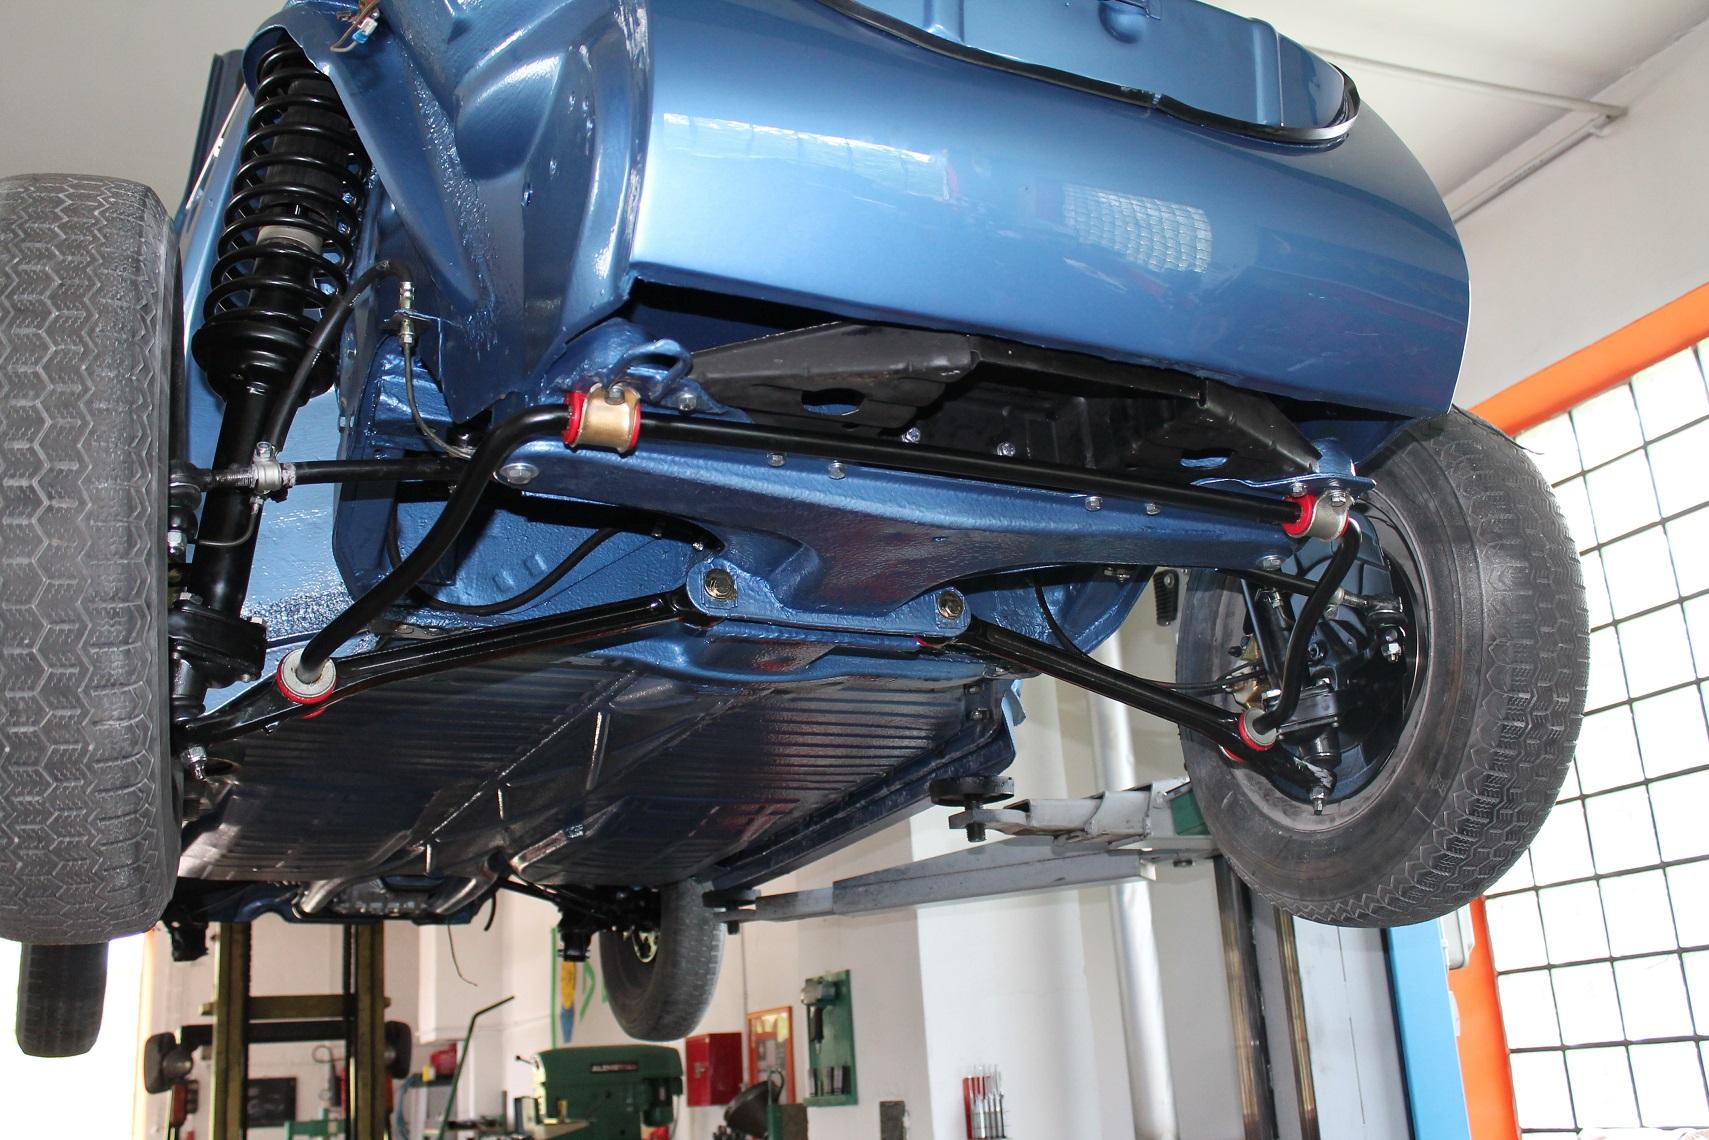 Vw Kaefer Cabrio Montage Unterboden on Fiat Ghia